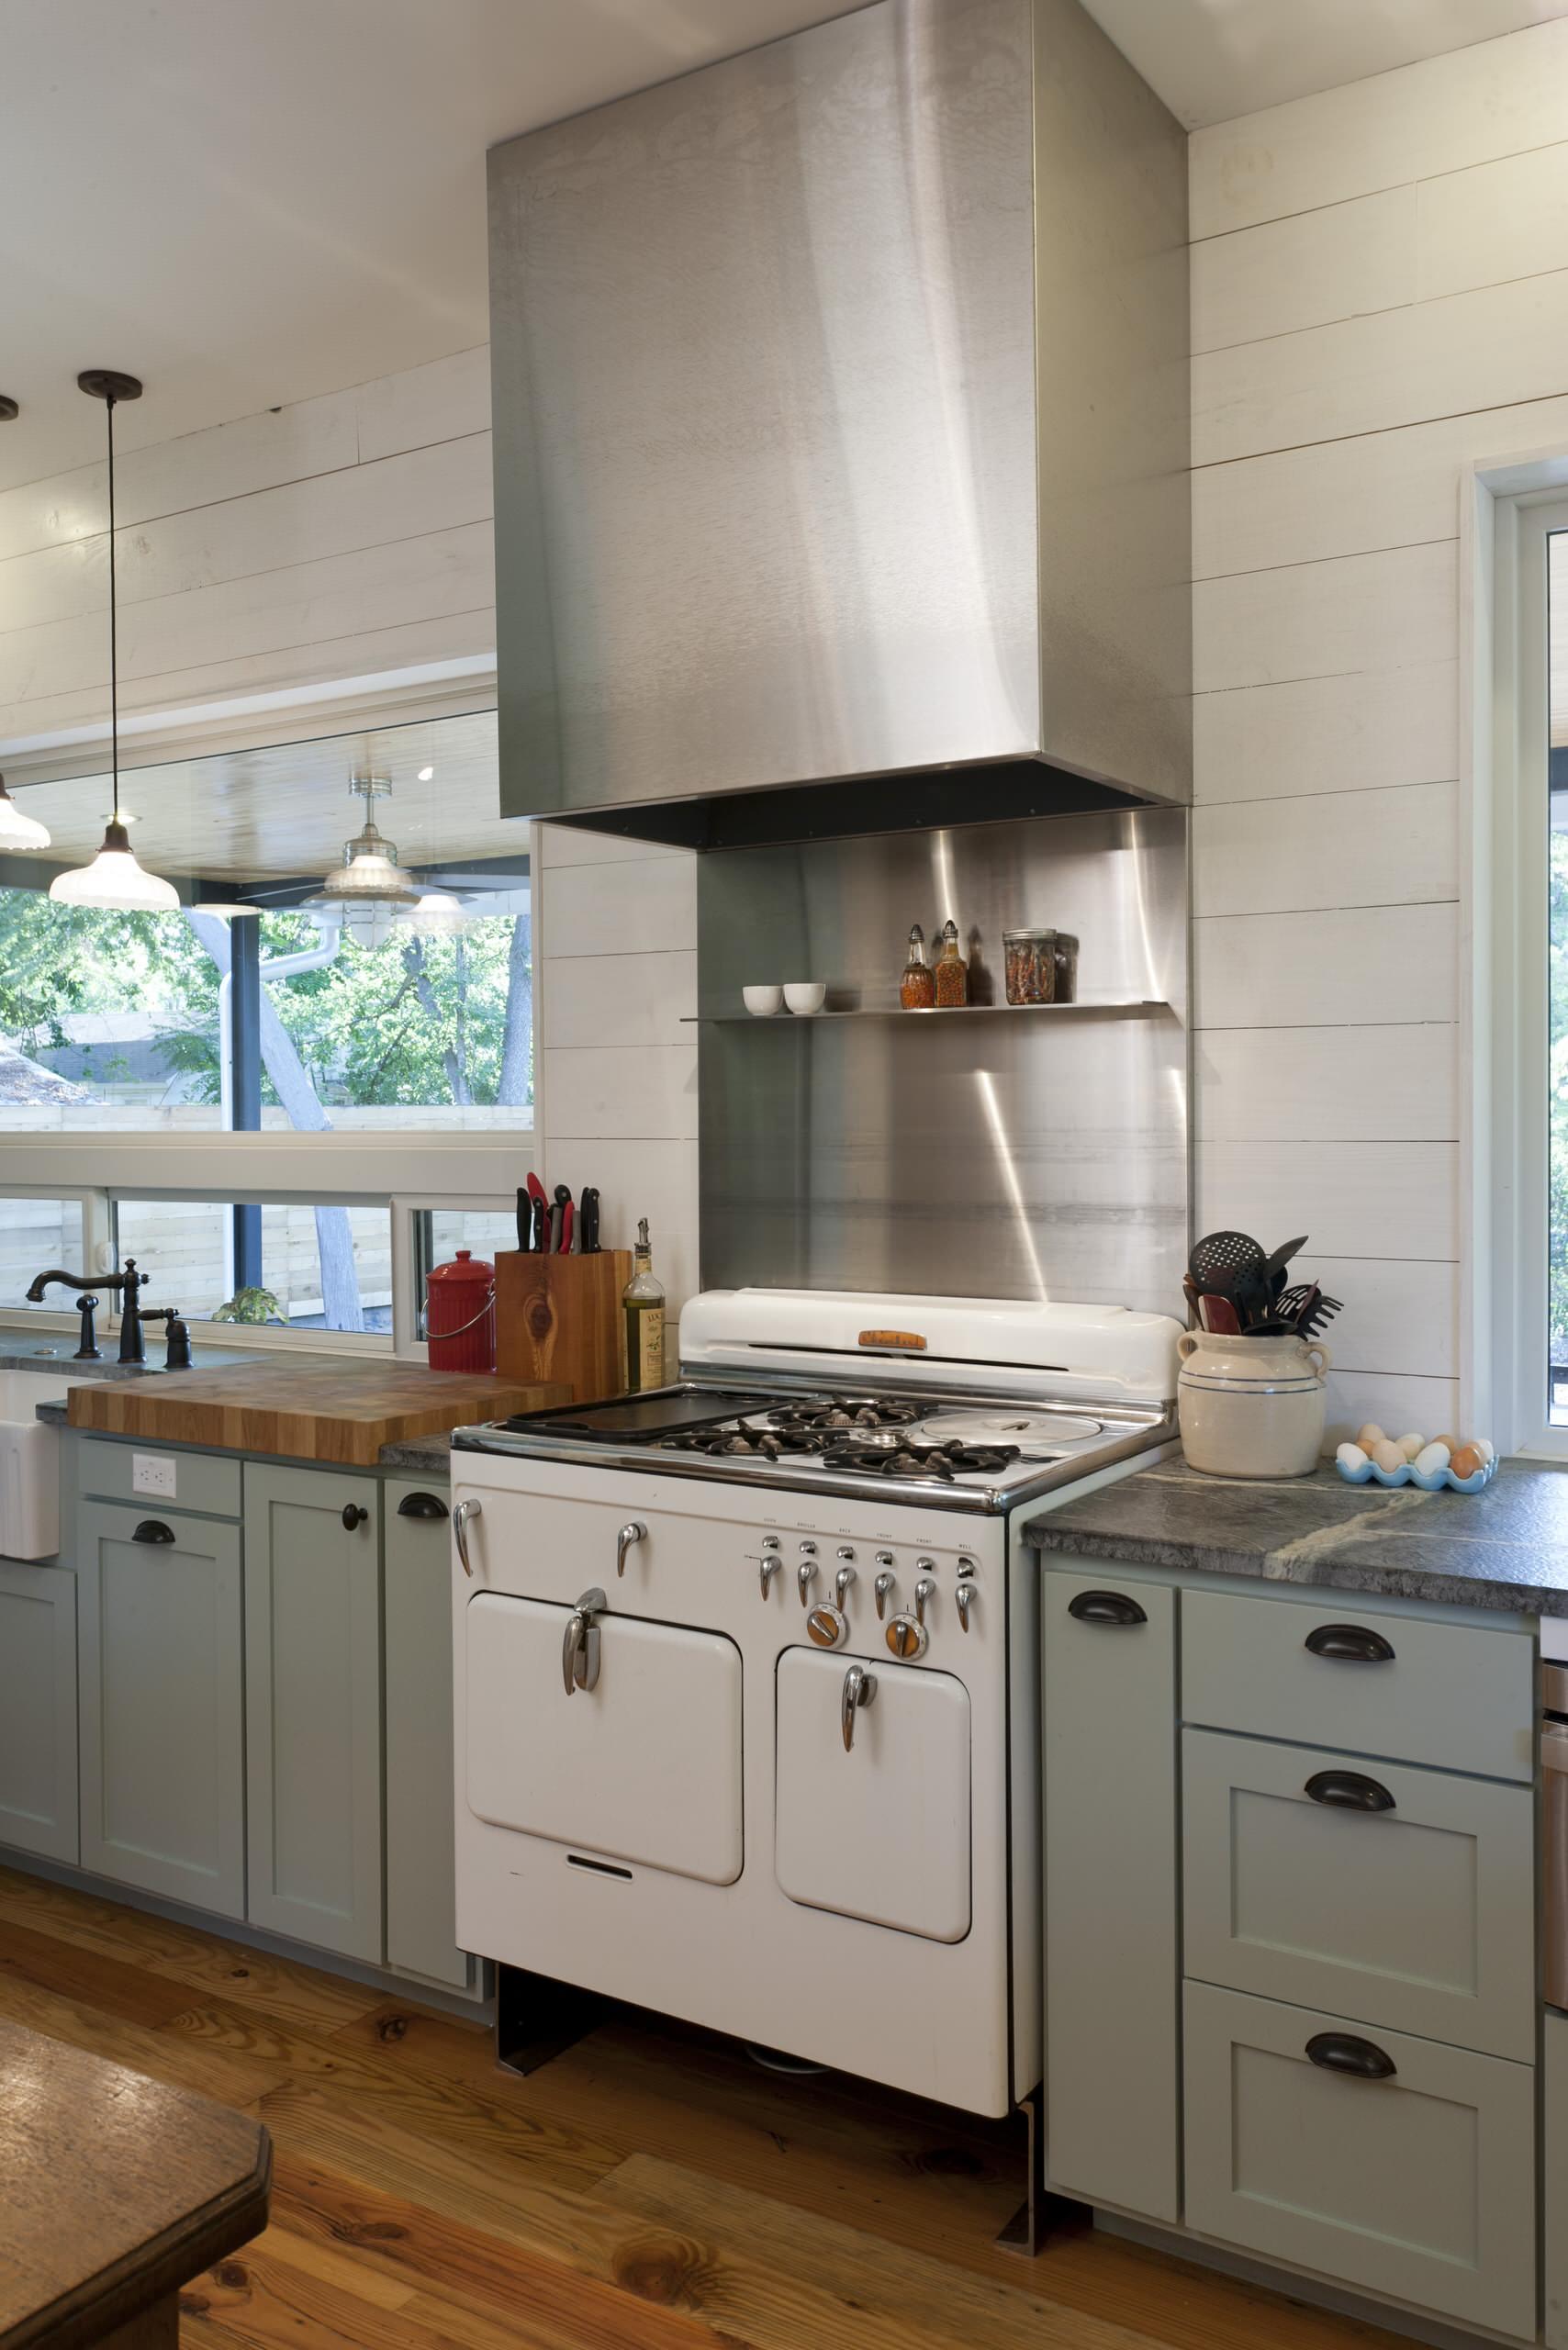 75 Beautiful Farmhouse Kitchen With Metal Backsplash Pictures Ideas November 2020 Houzz